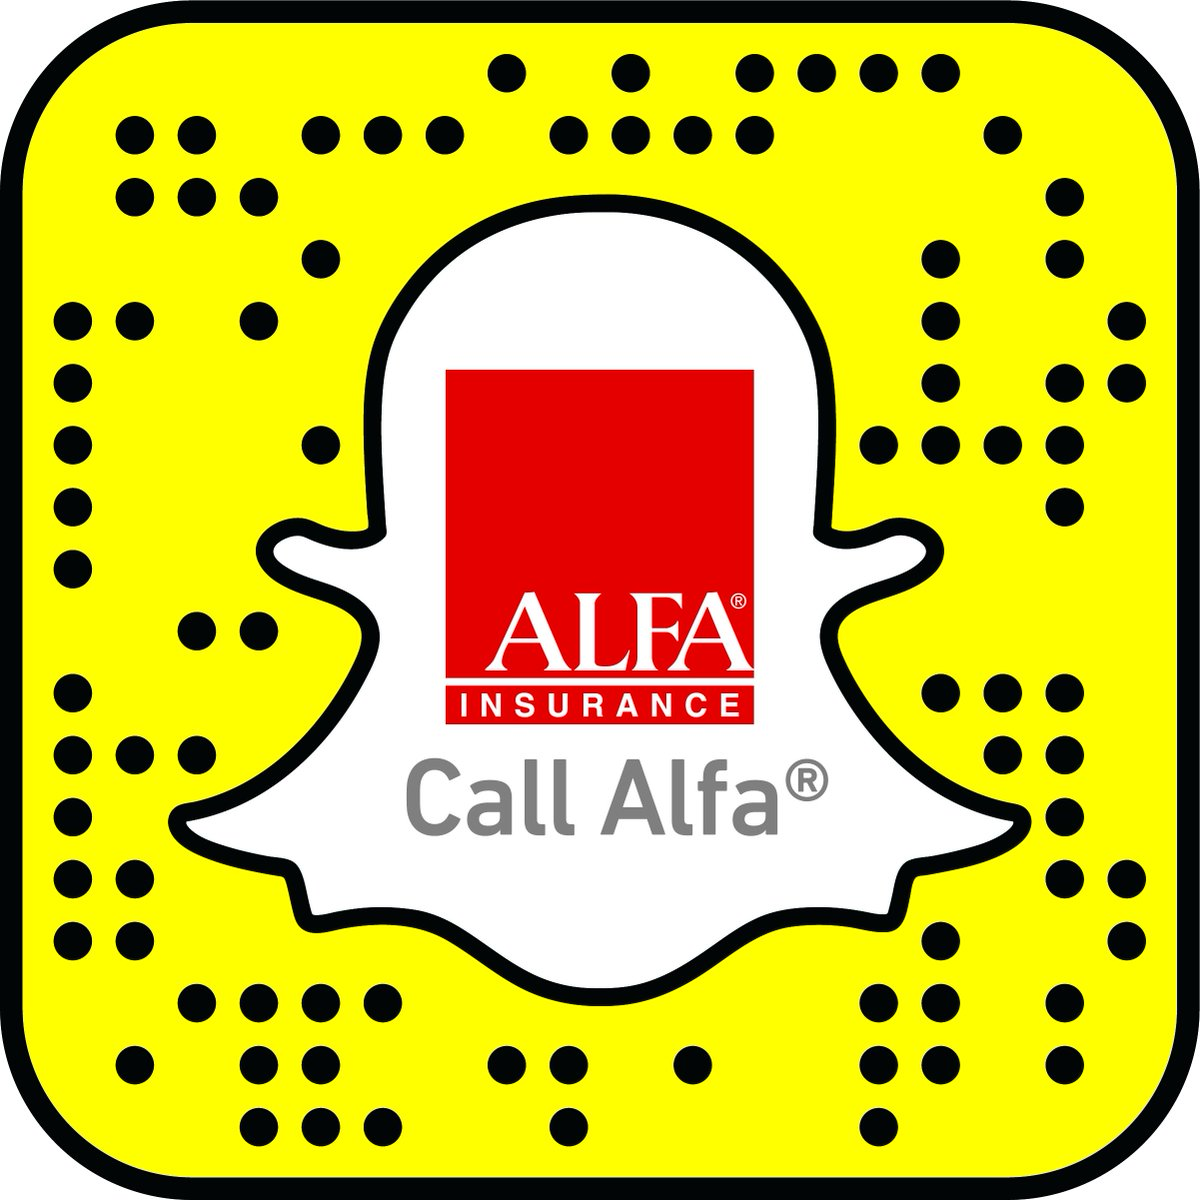 alfa insurance alfa insurance twitter. Black Bedroom Furniture Sets. Home Design Ideas